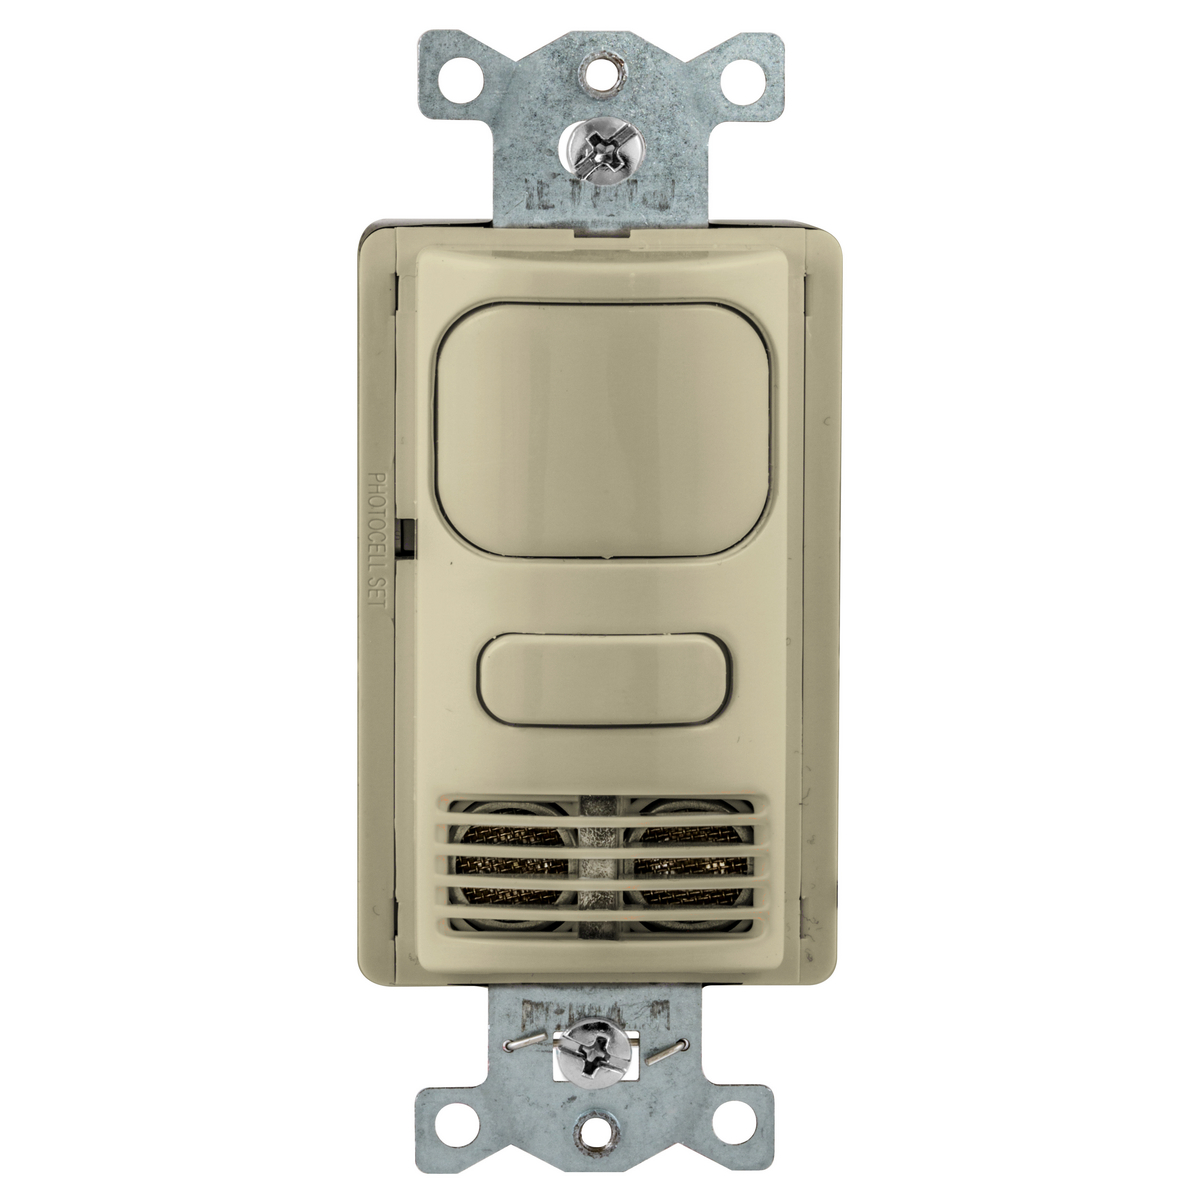 Wiring Device-KellemsAD2000I1